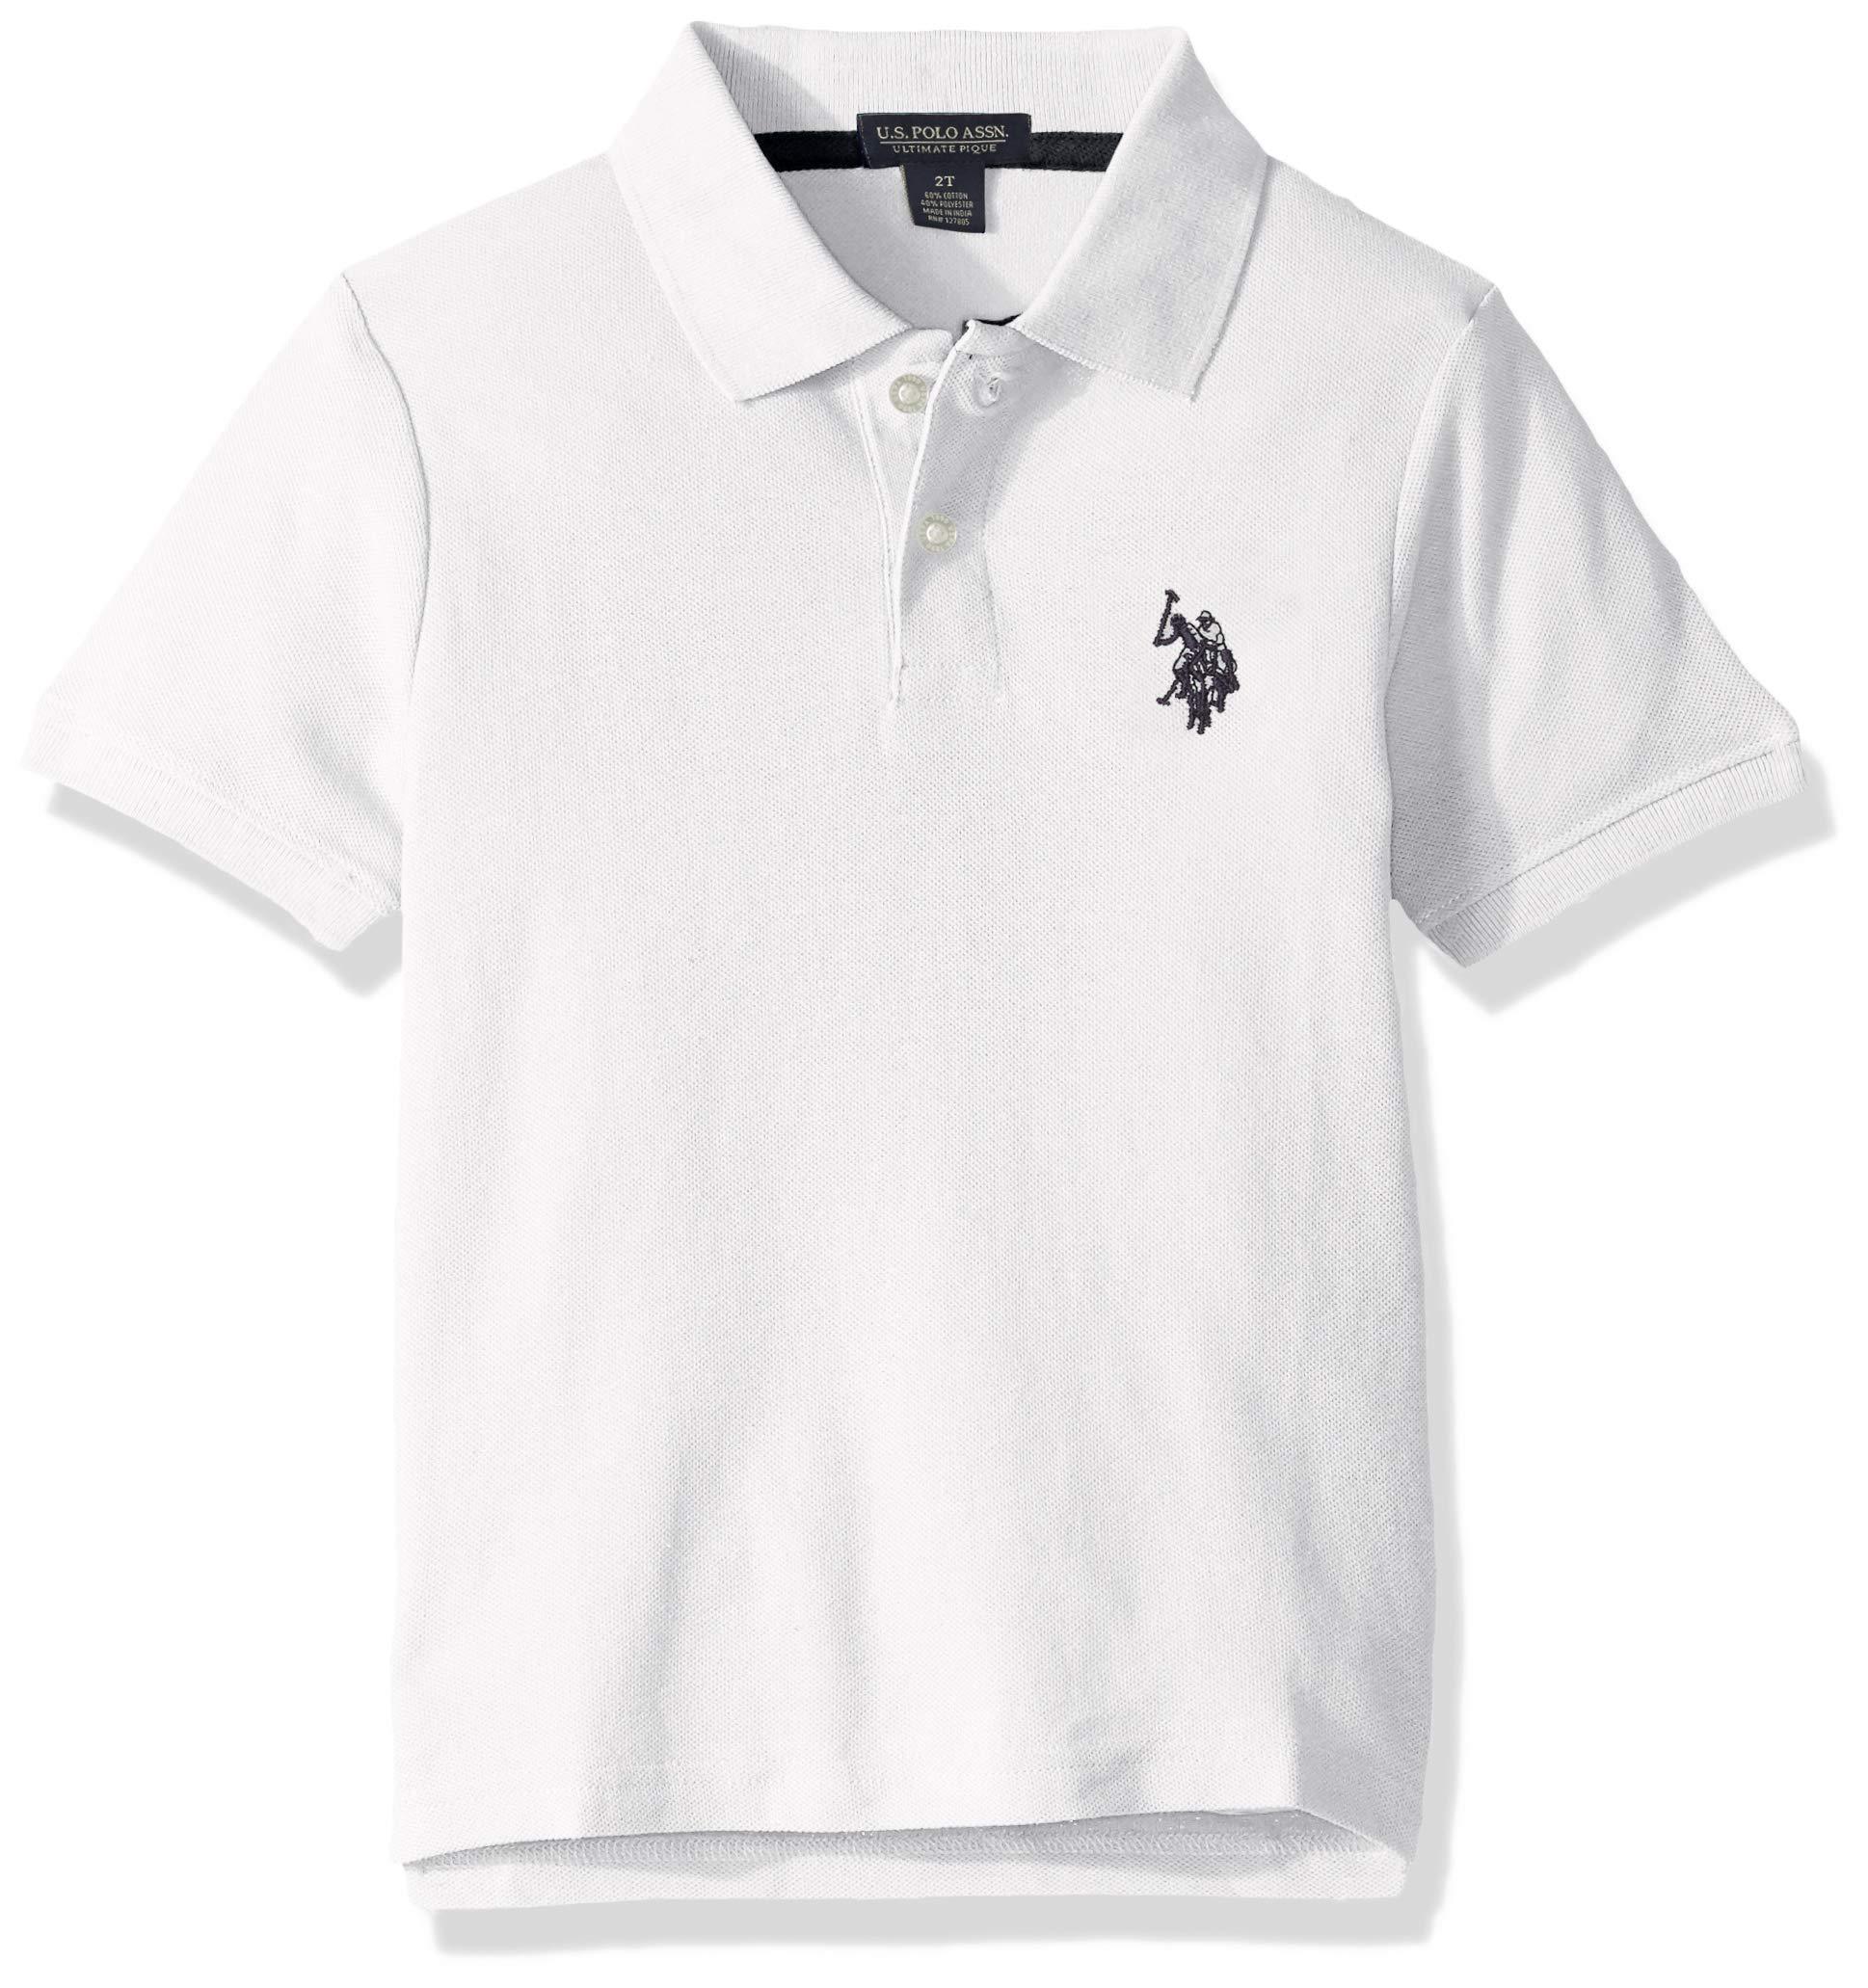 U.S. Polo Assn. Boys' Big Short Sleeve Performance Polo Shirt, White, 14/16